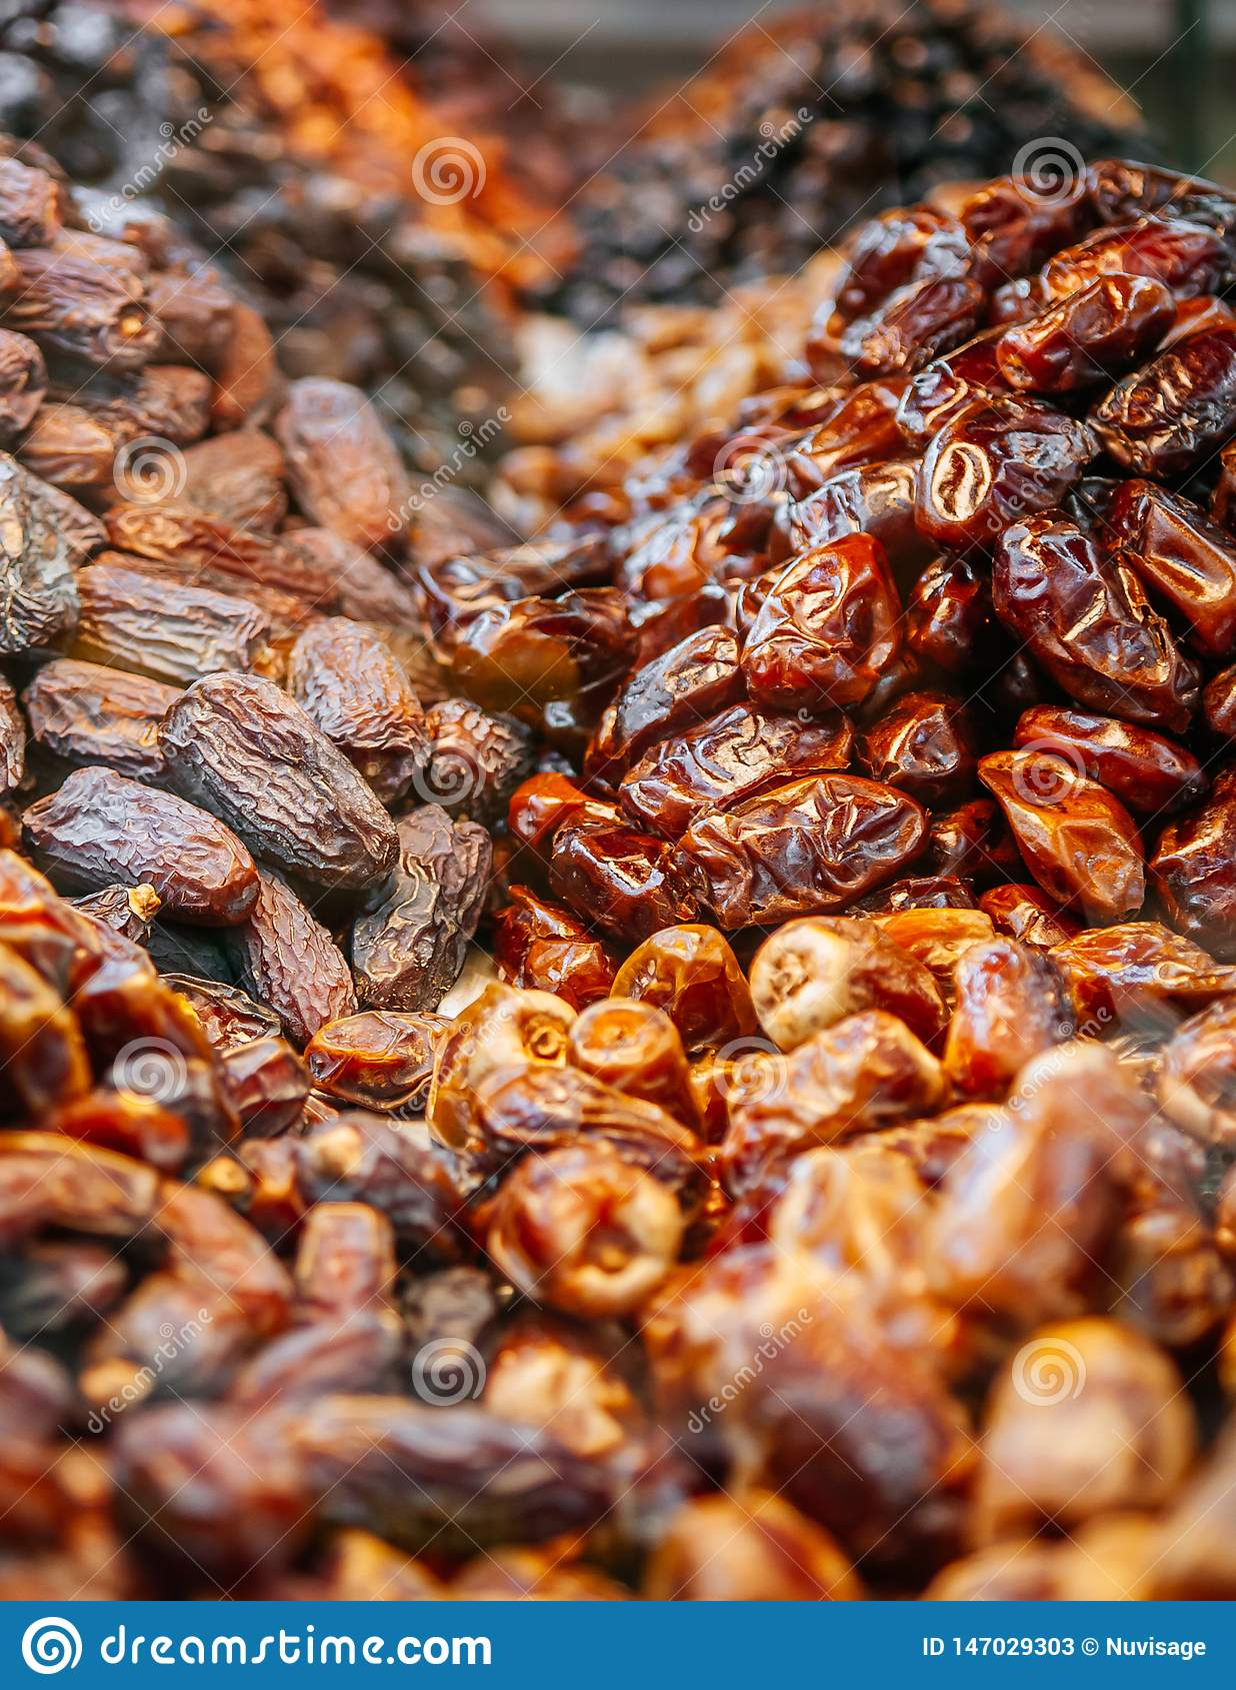 Sweet Dry Date Palm Fruit In Souk Or Market Abu Dhabi  UAE Stock